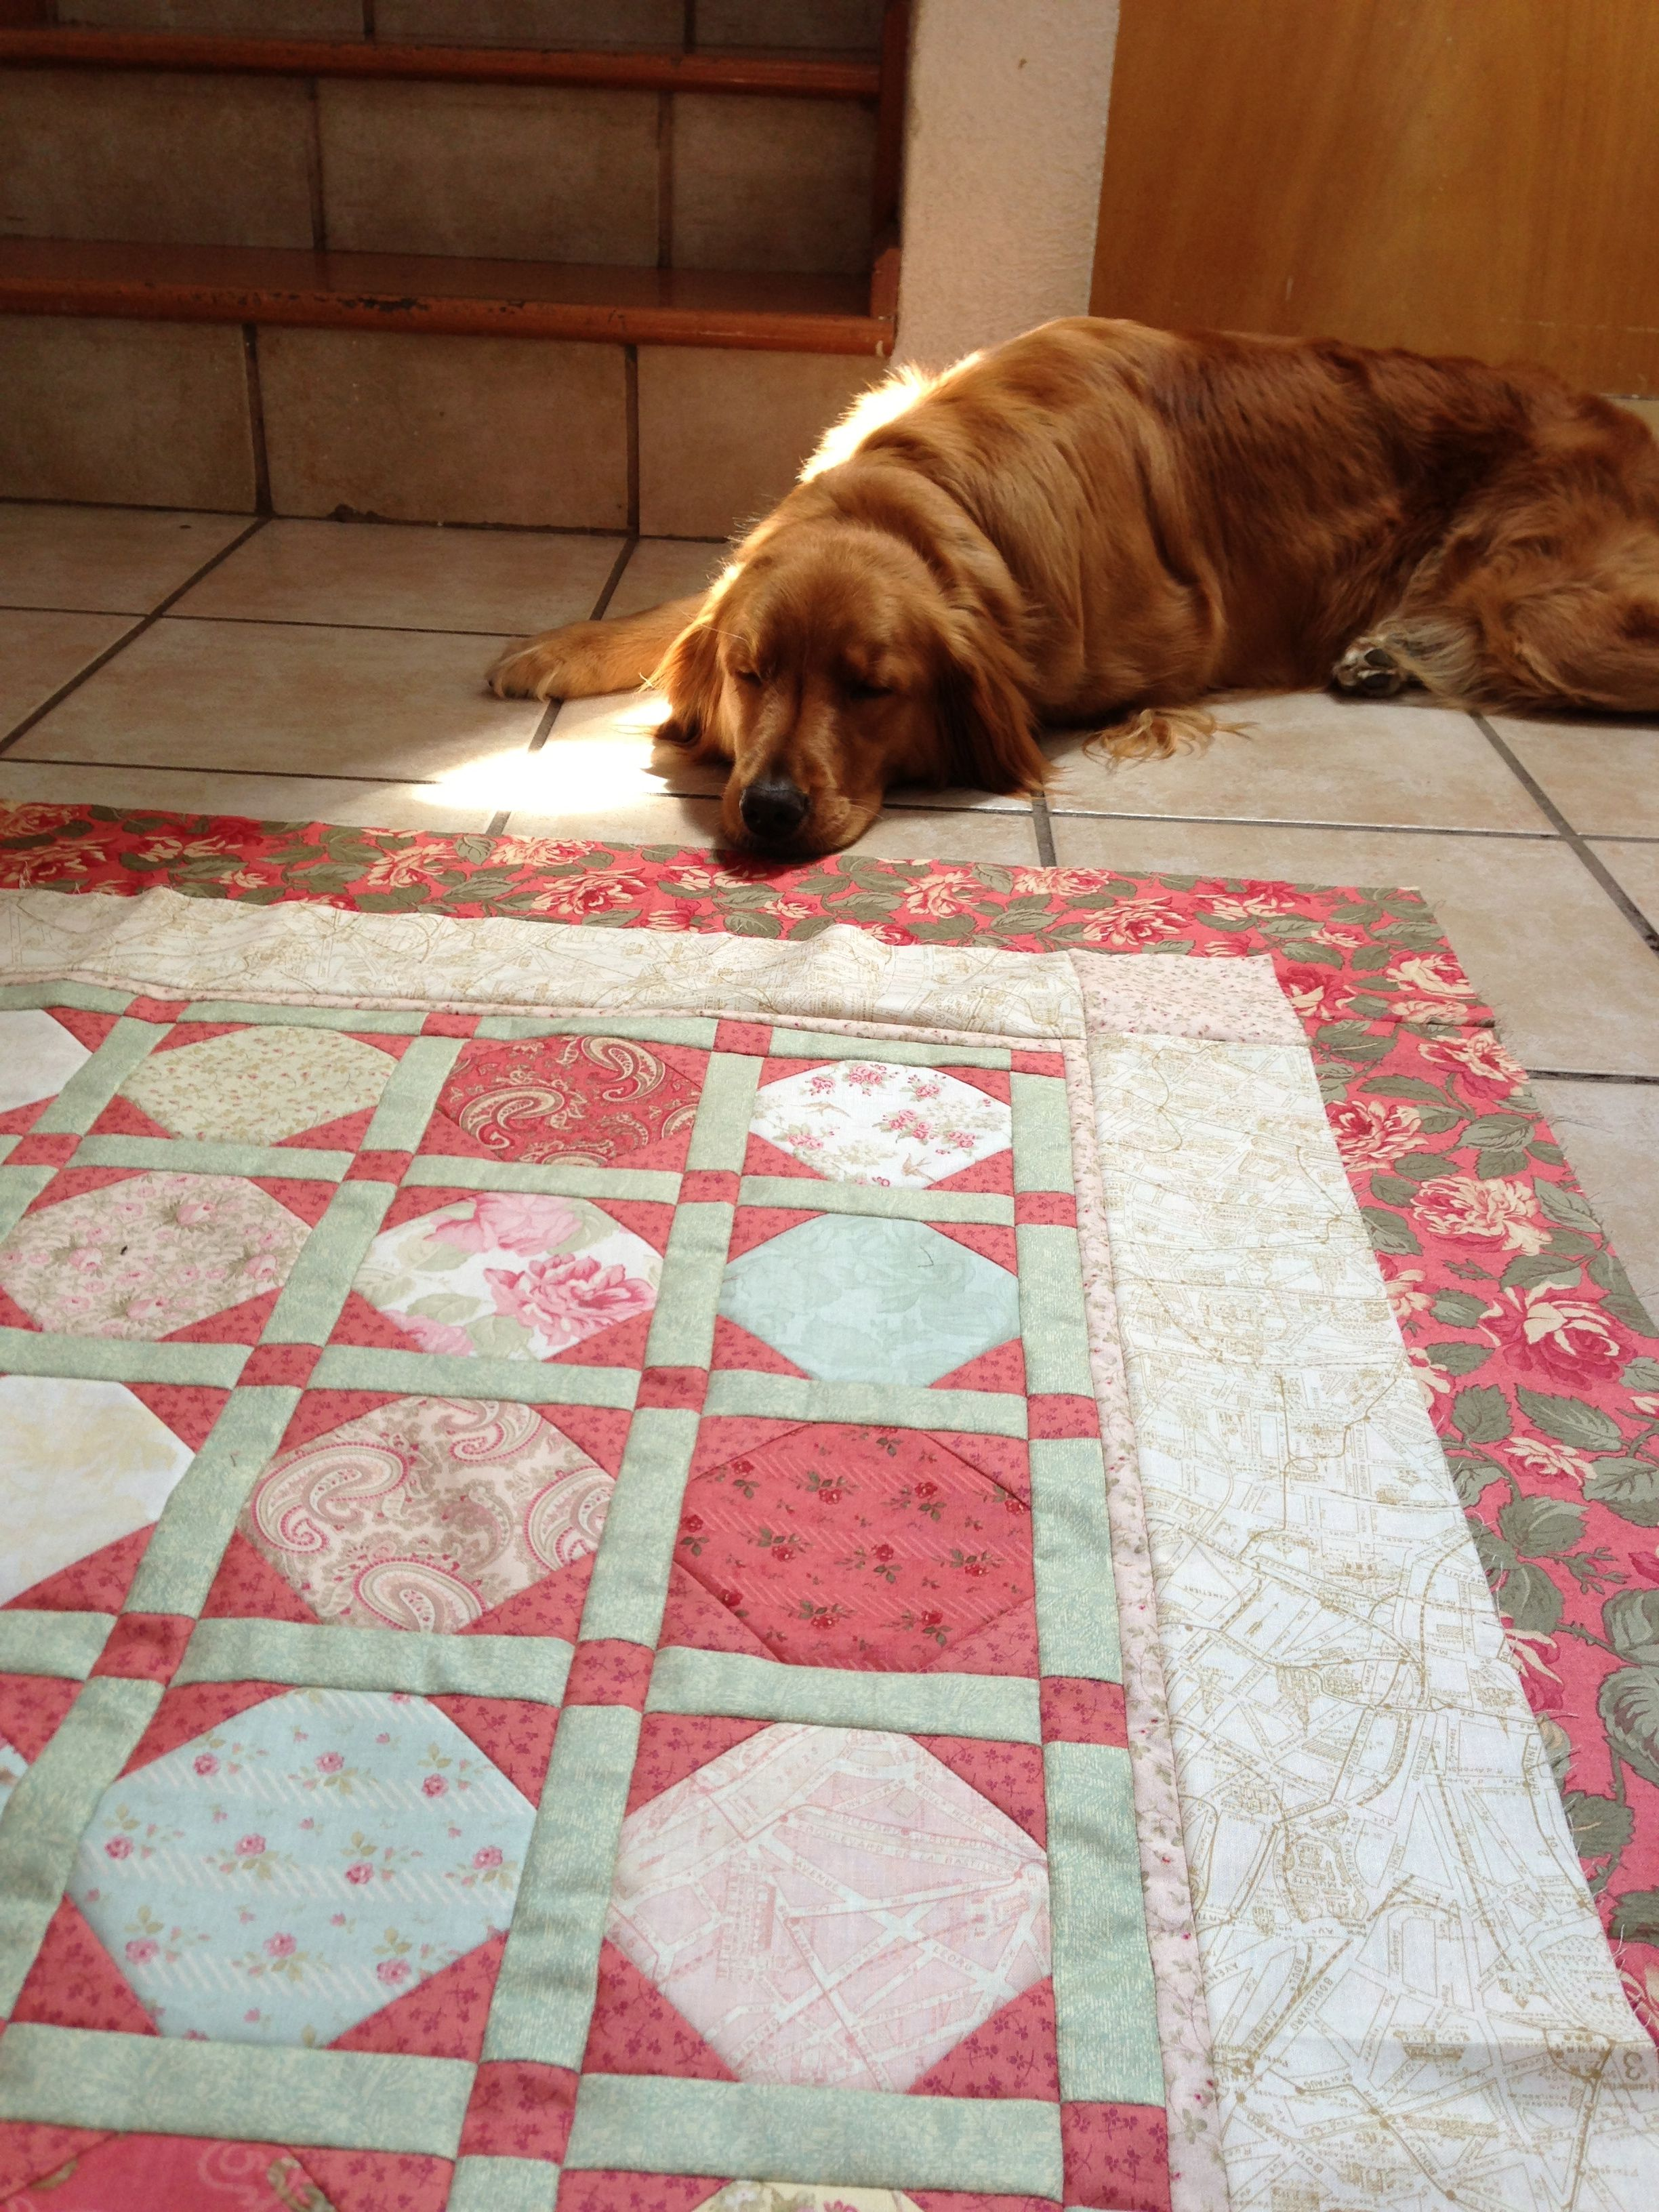 emilia and the paris flea market quilt